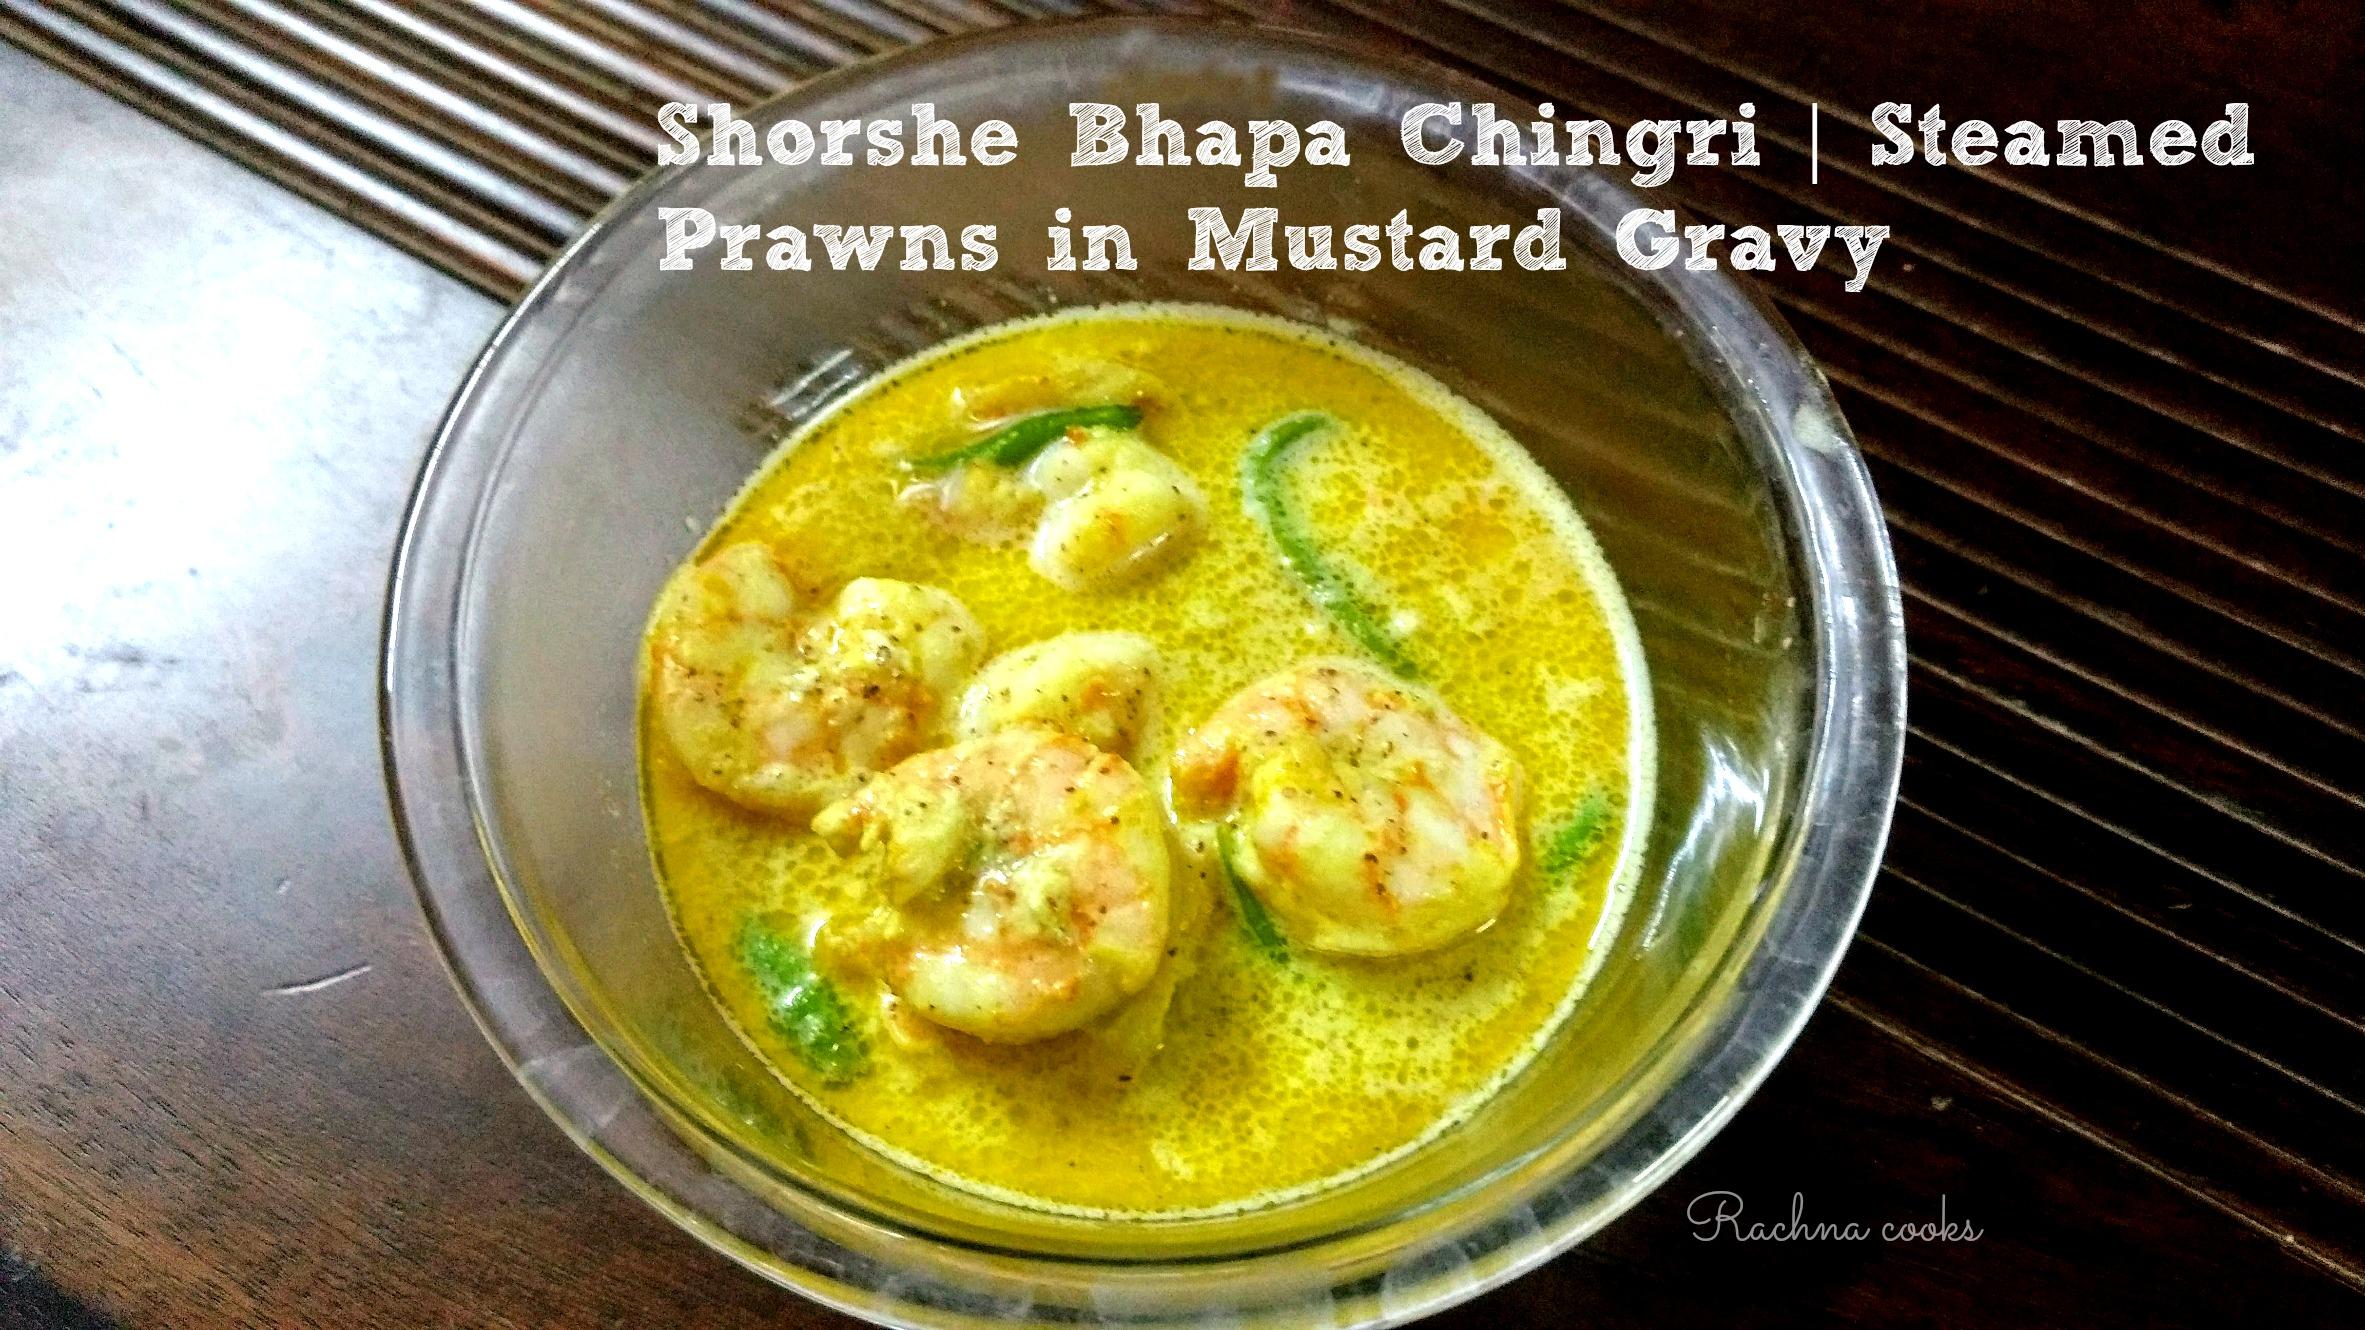 shorshe bhapa chingri